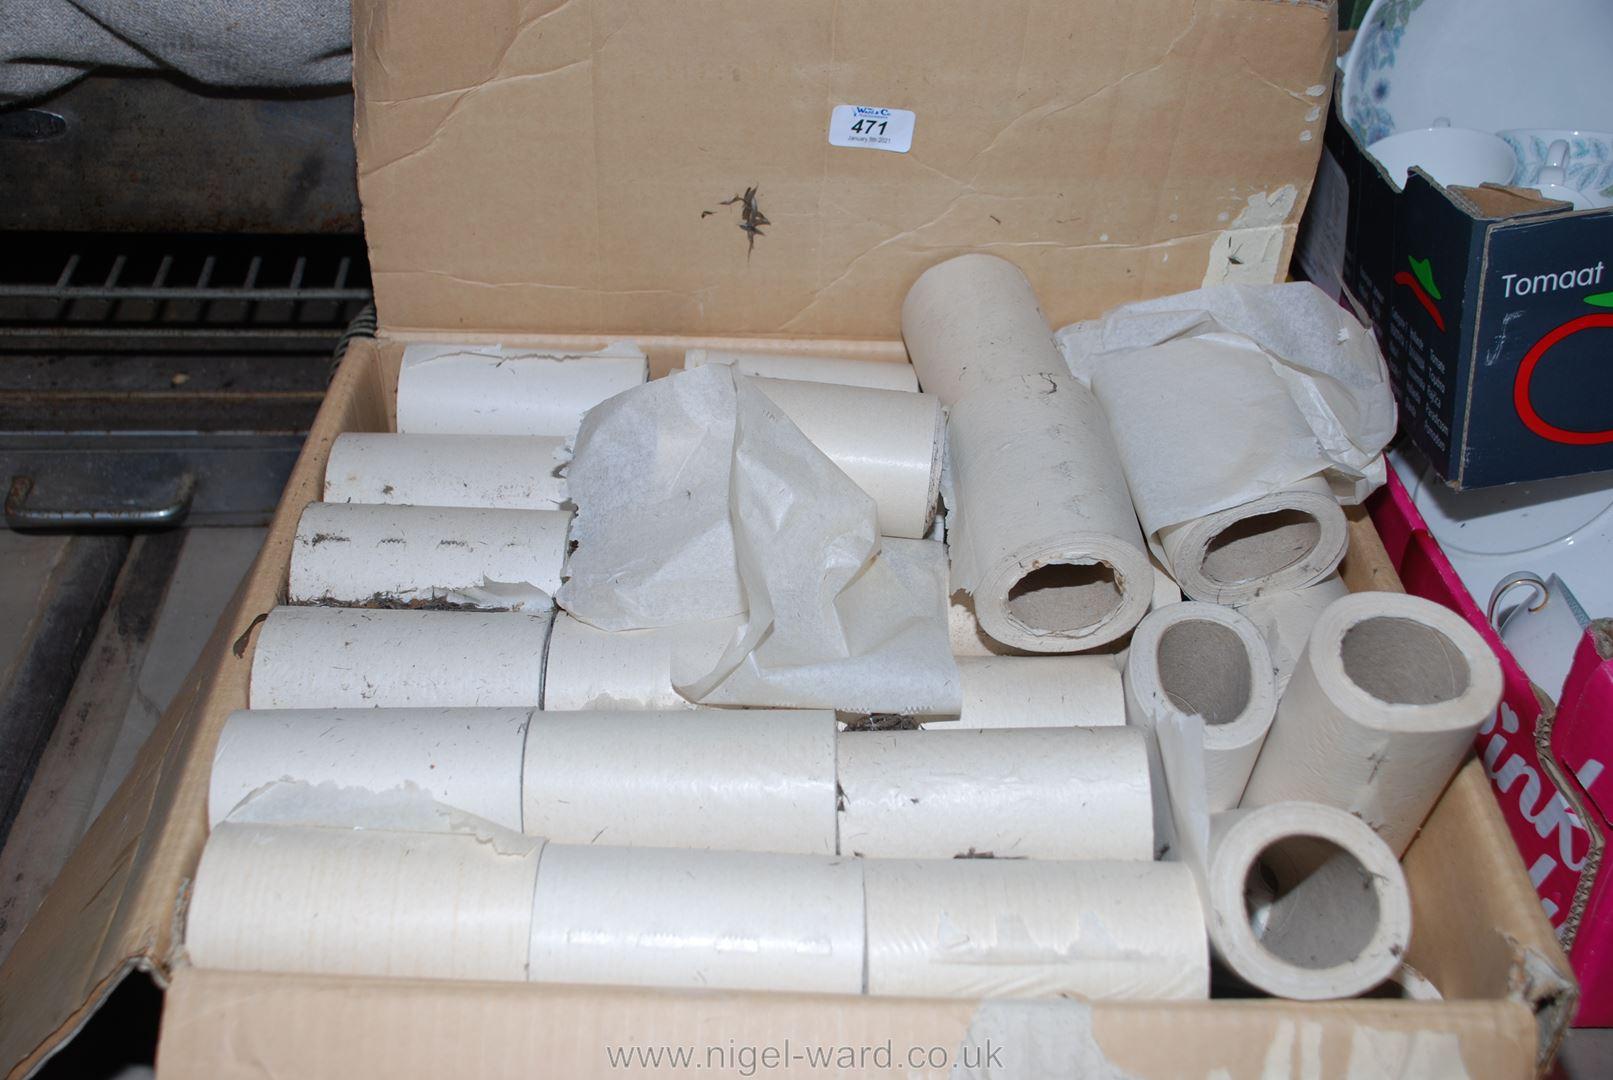 A box of vintage single-ply toilet tissue.